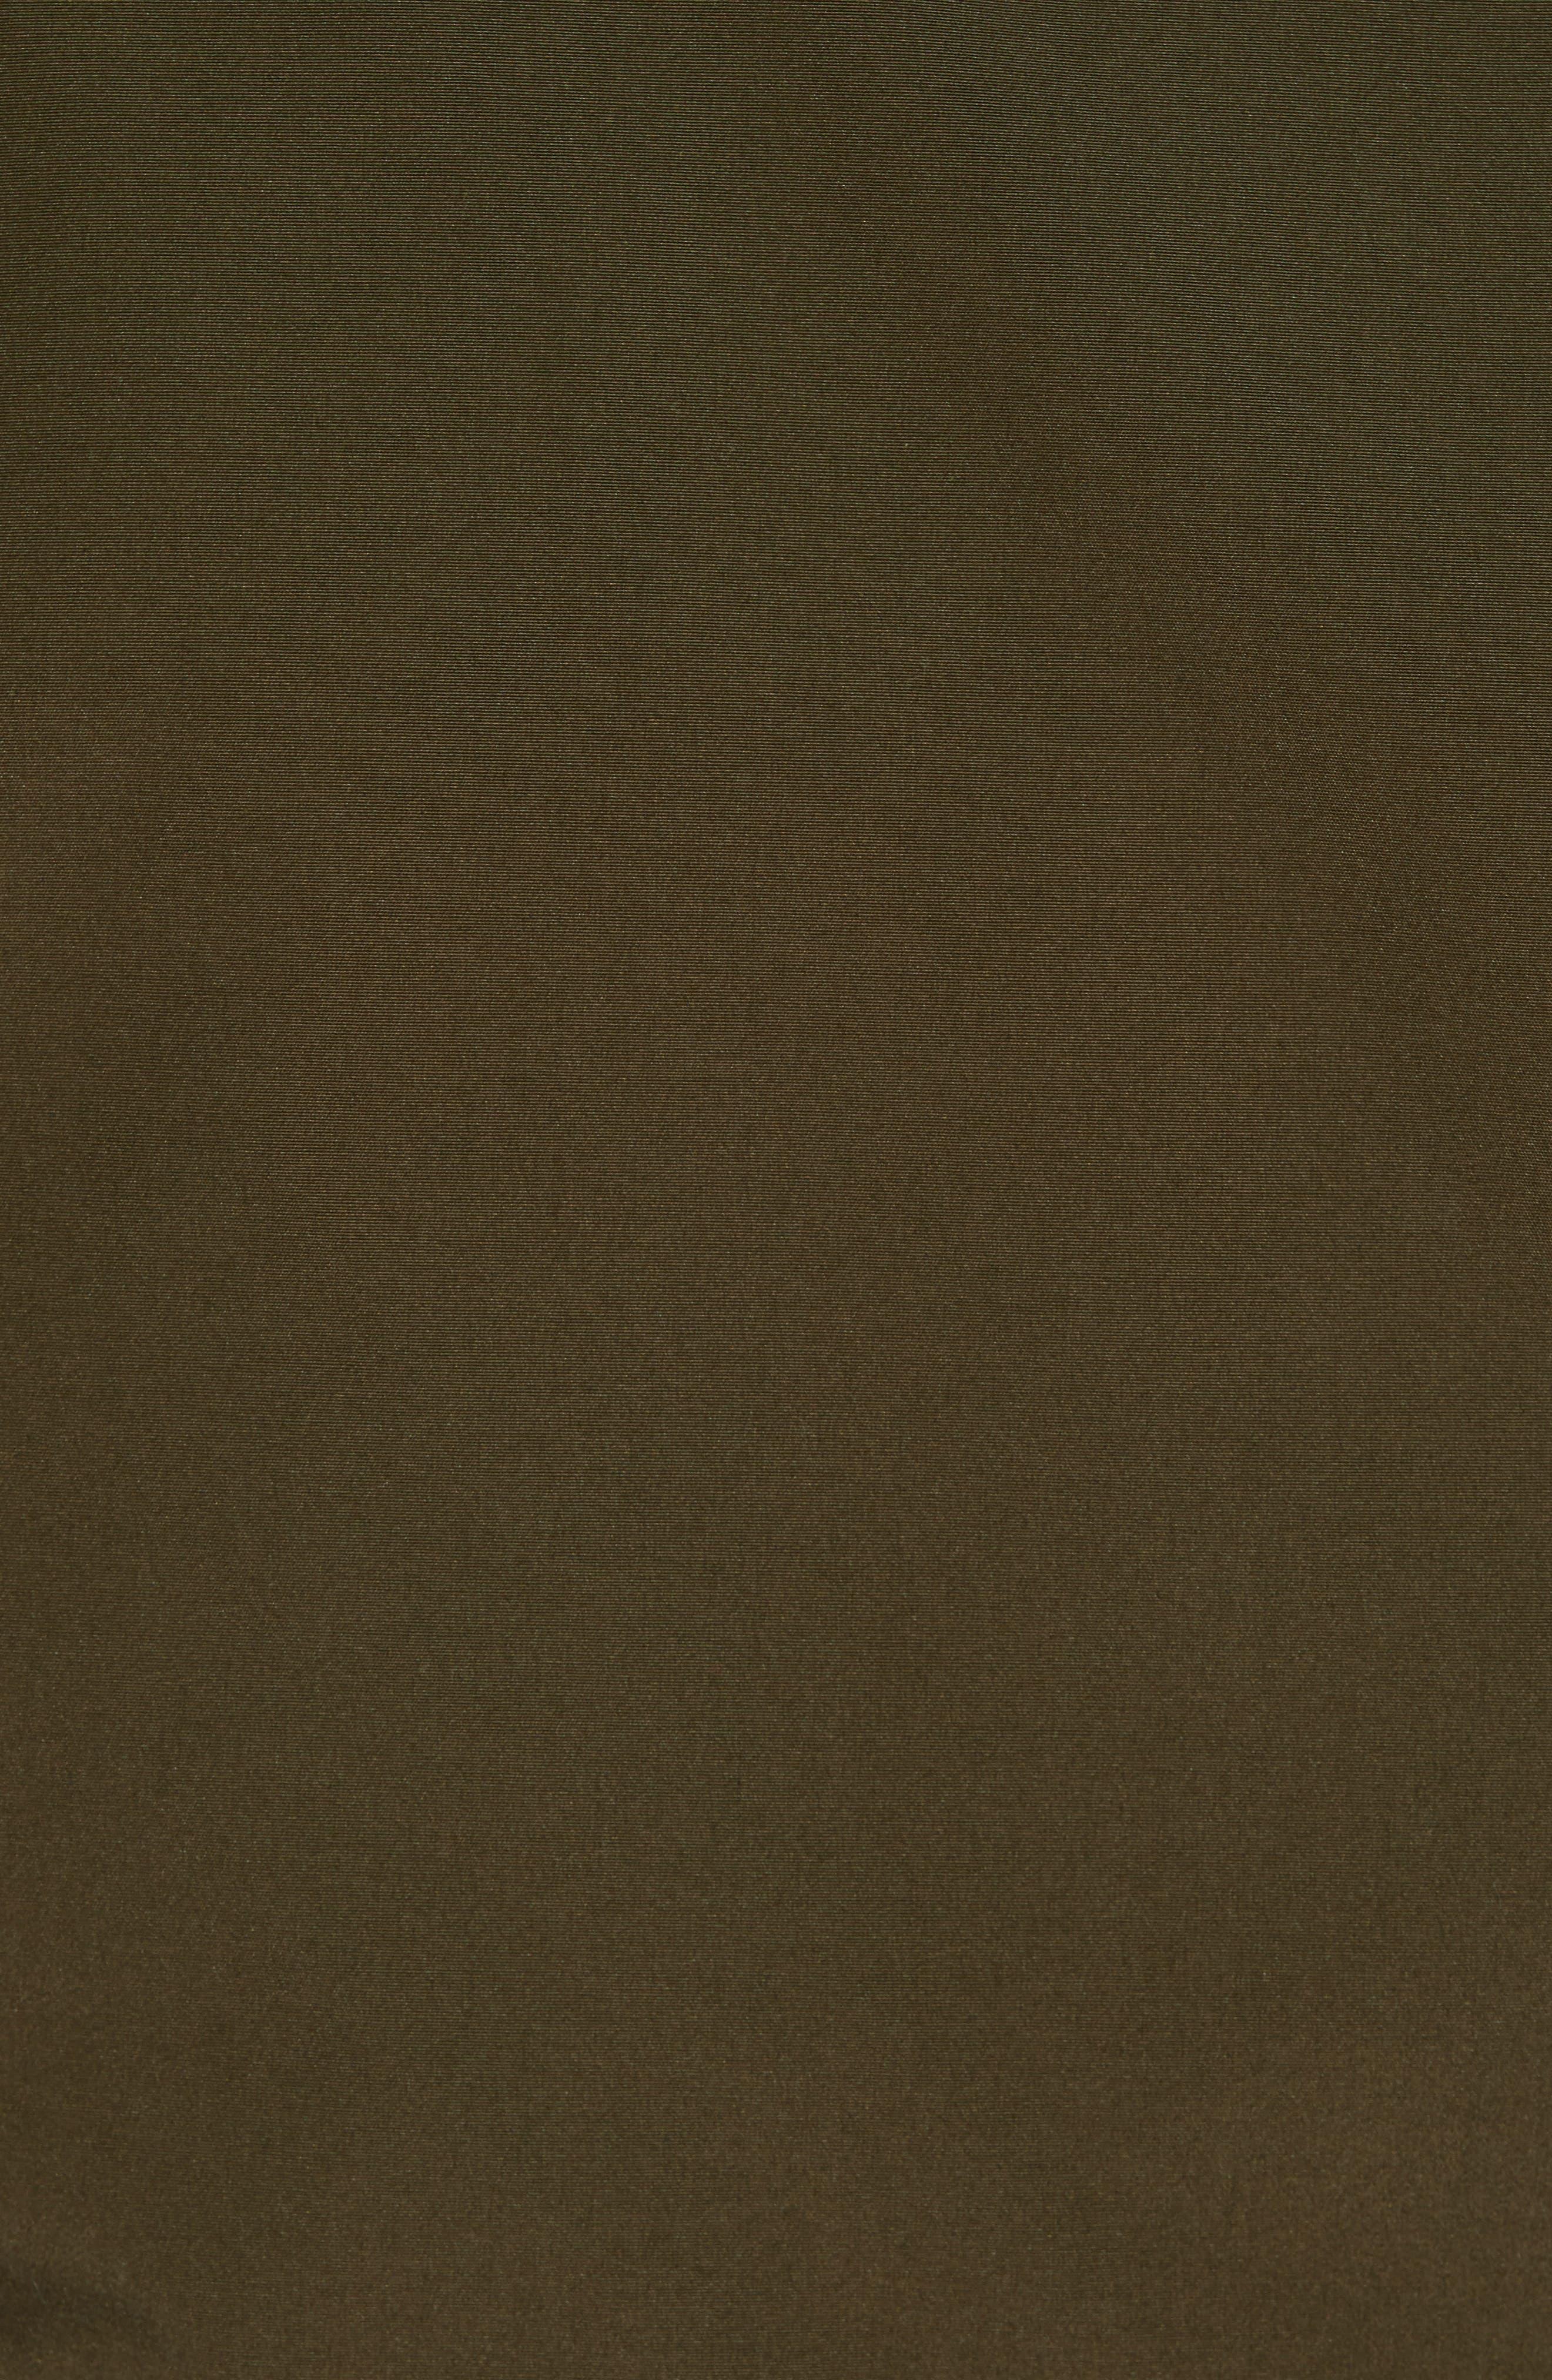 Down Hooded Jacket with Faux Fur Trim,                             Alternate thumbnail 6, color,                             KHAKI